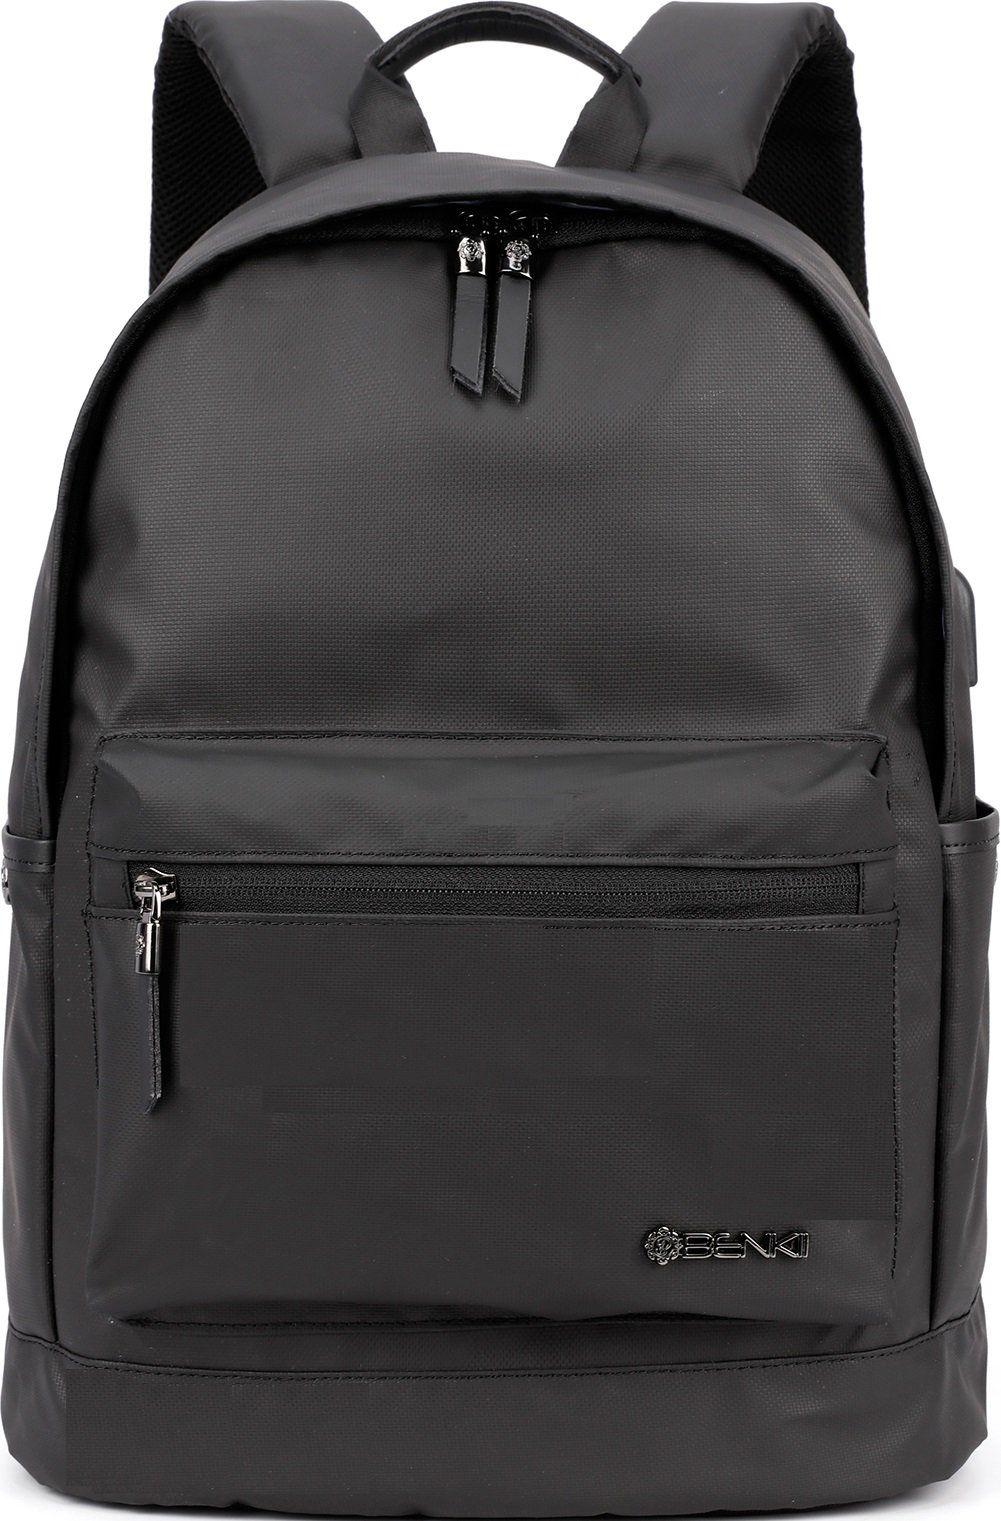 Backpack w USB Charging Port Fits UNDER 15